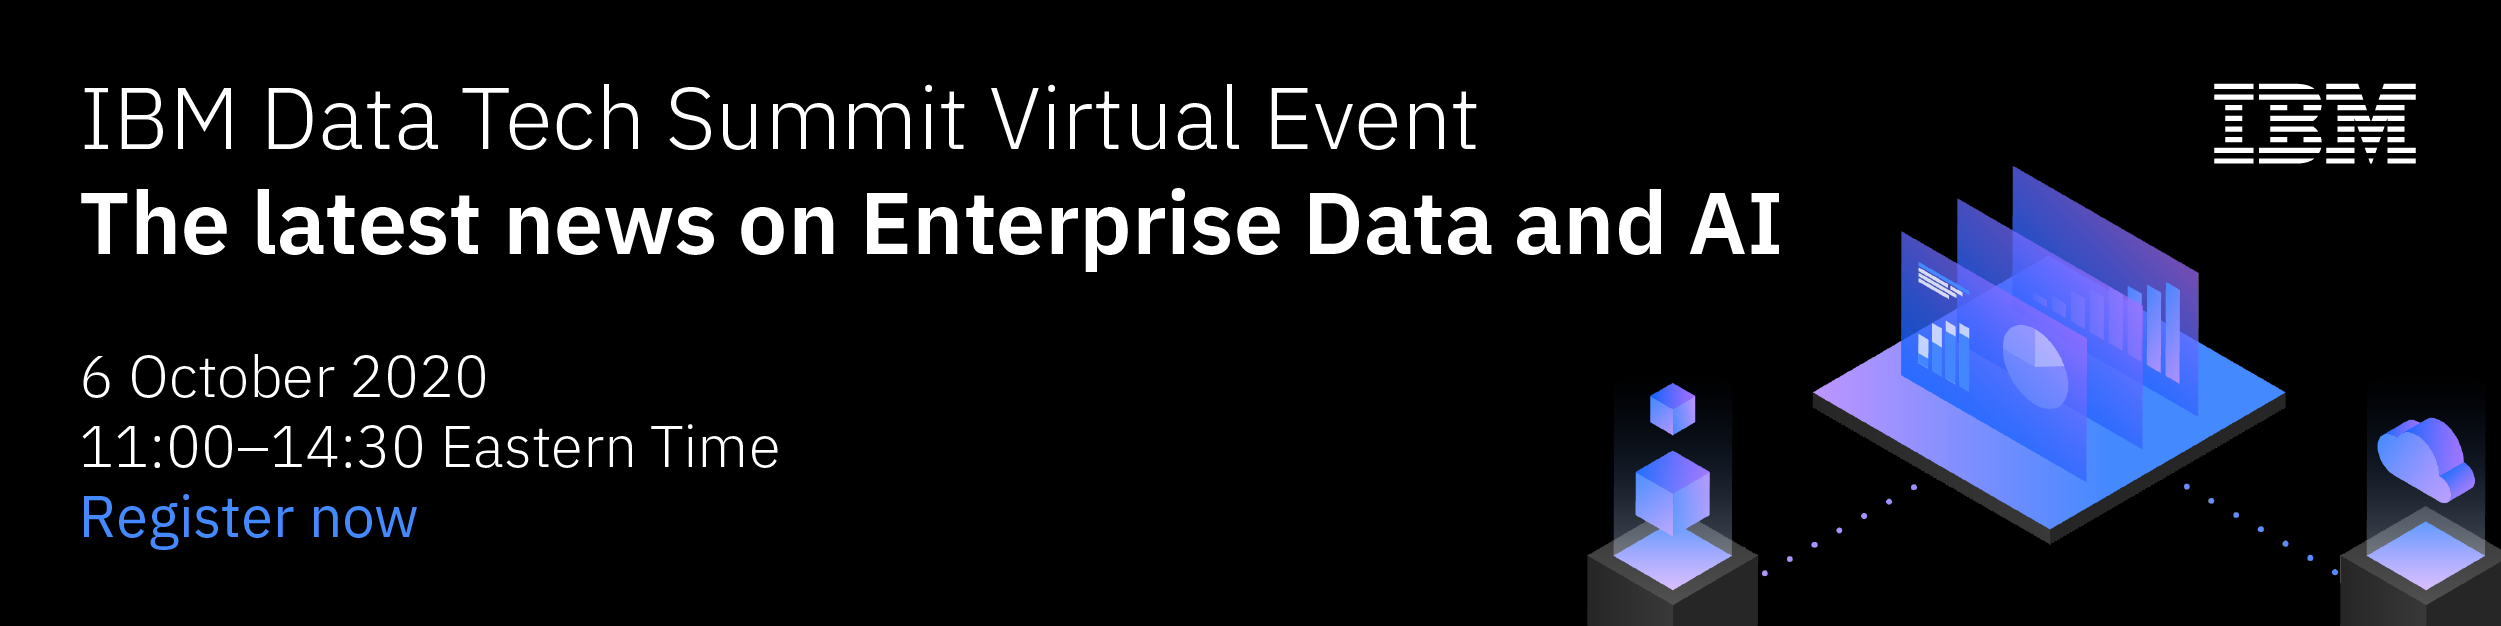 The Latest News on Enterprise Data & AI